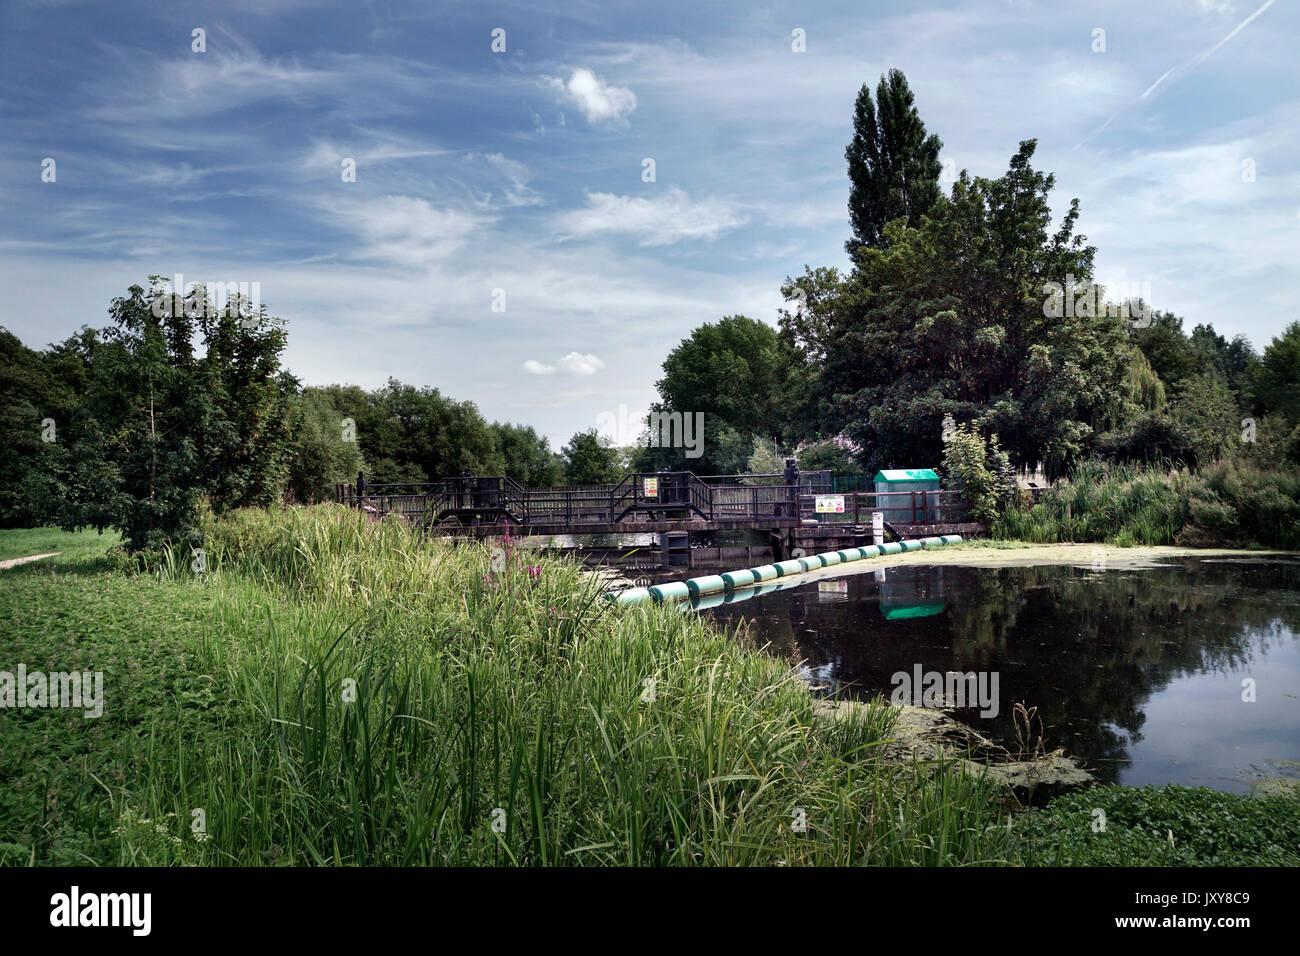 sluice gates  on river waveney at bungay suffolk united kingdom - Stock Image